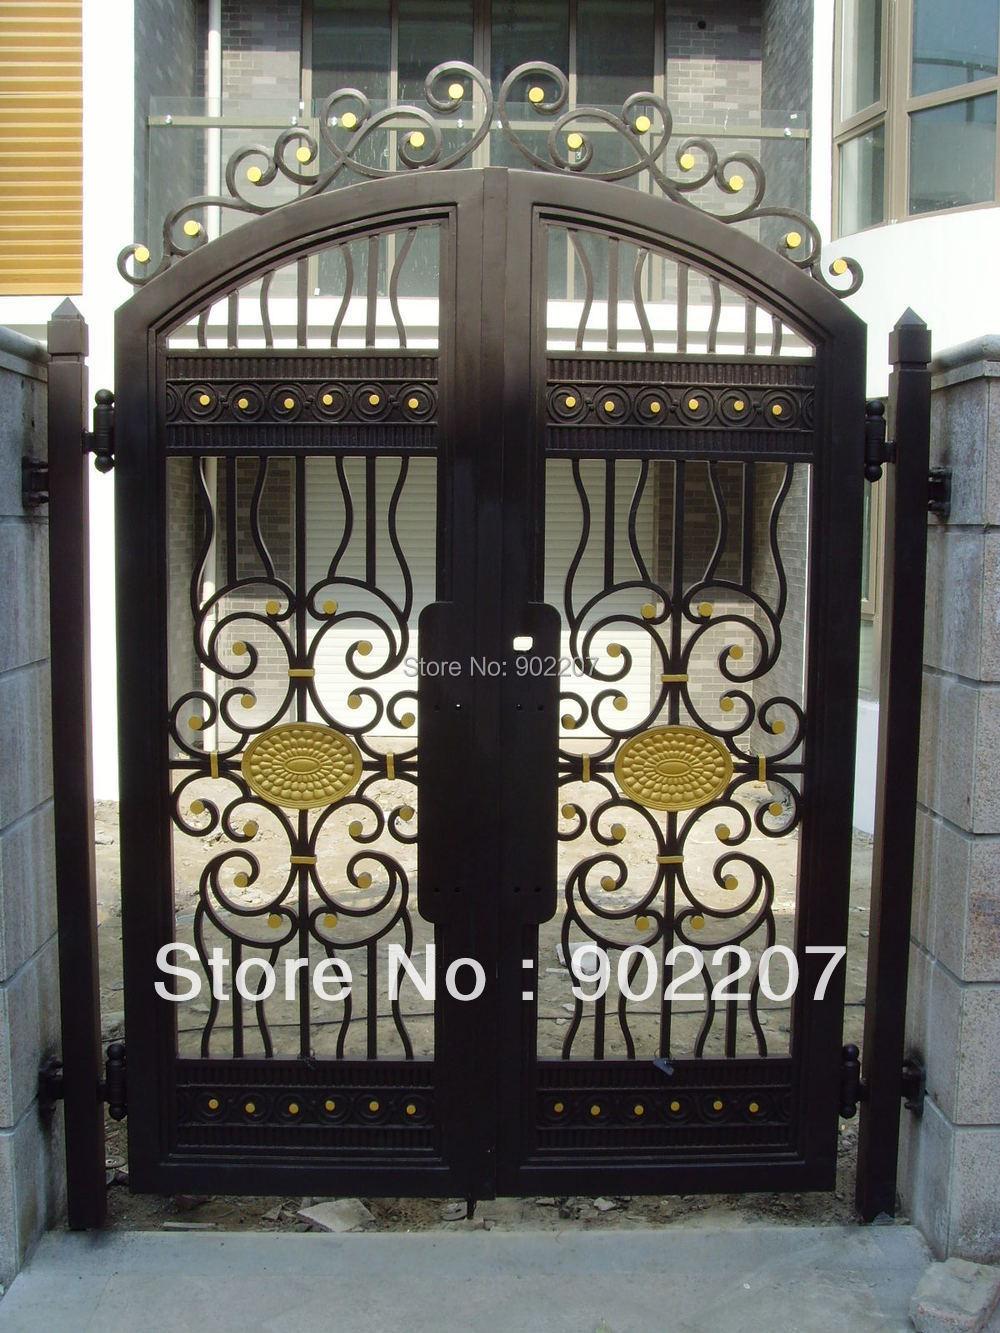 Entrance iron gates promotion shop for promotional